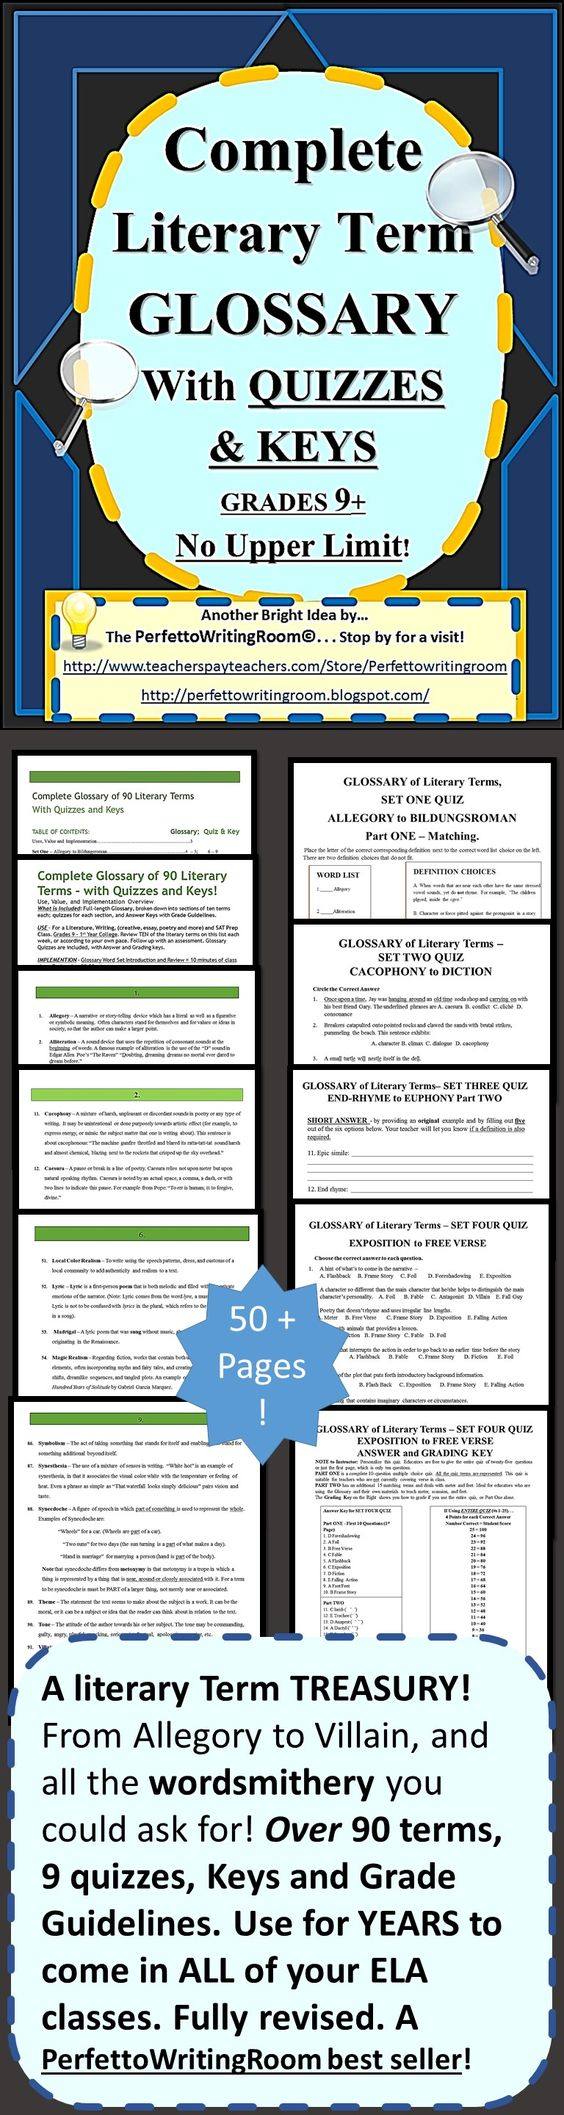 Literary terms dictionary pdf